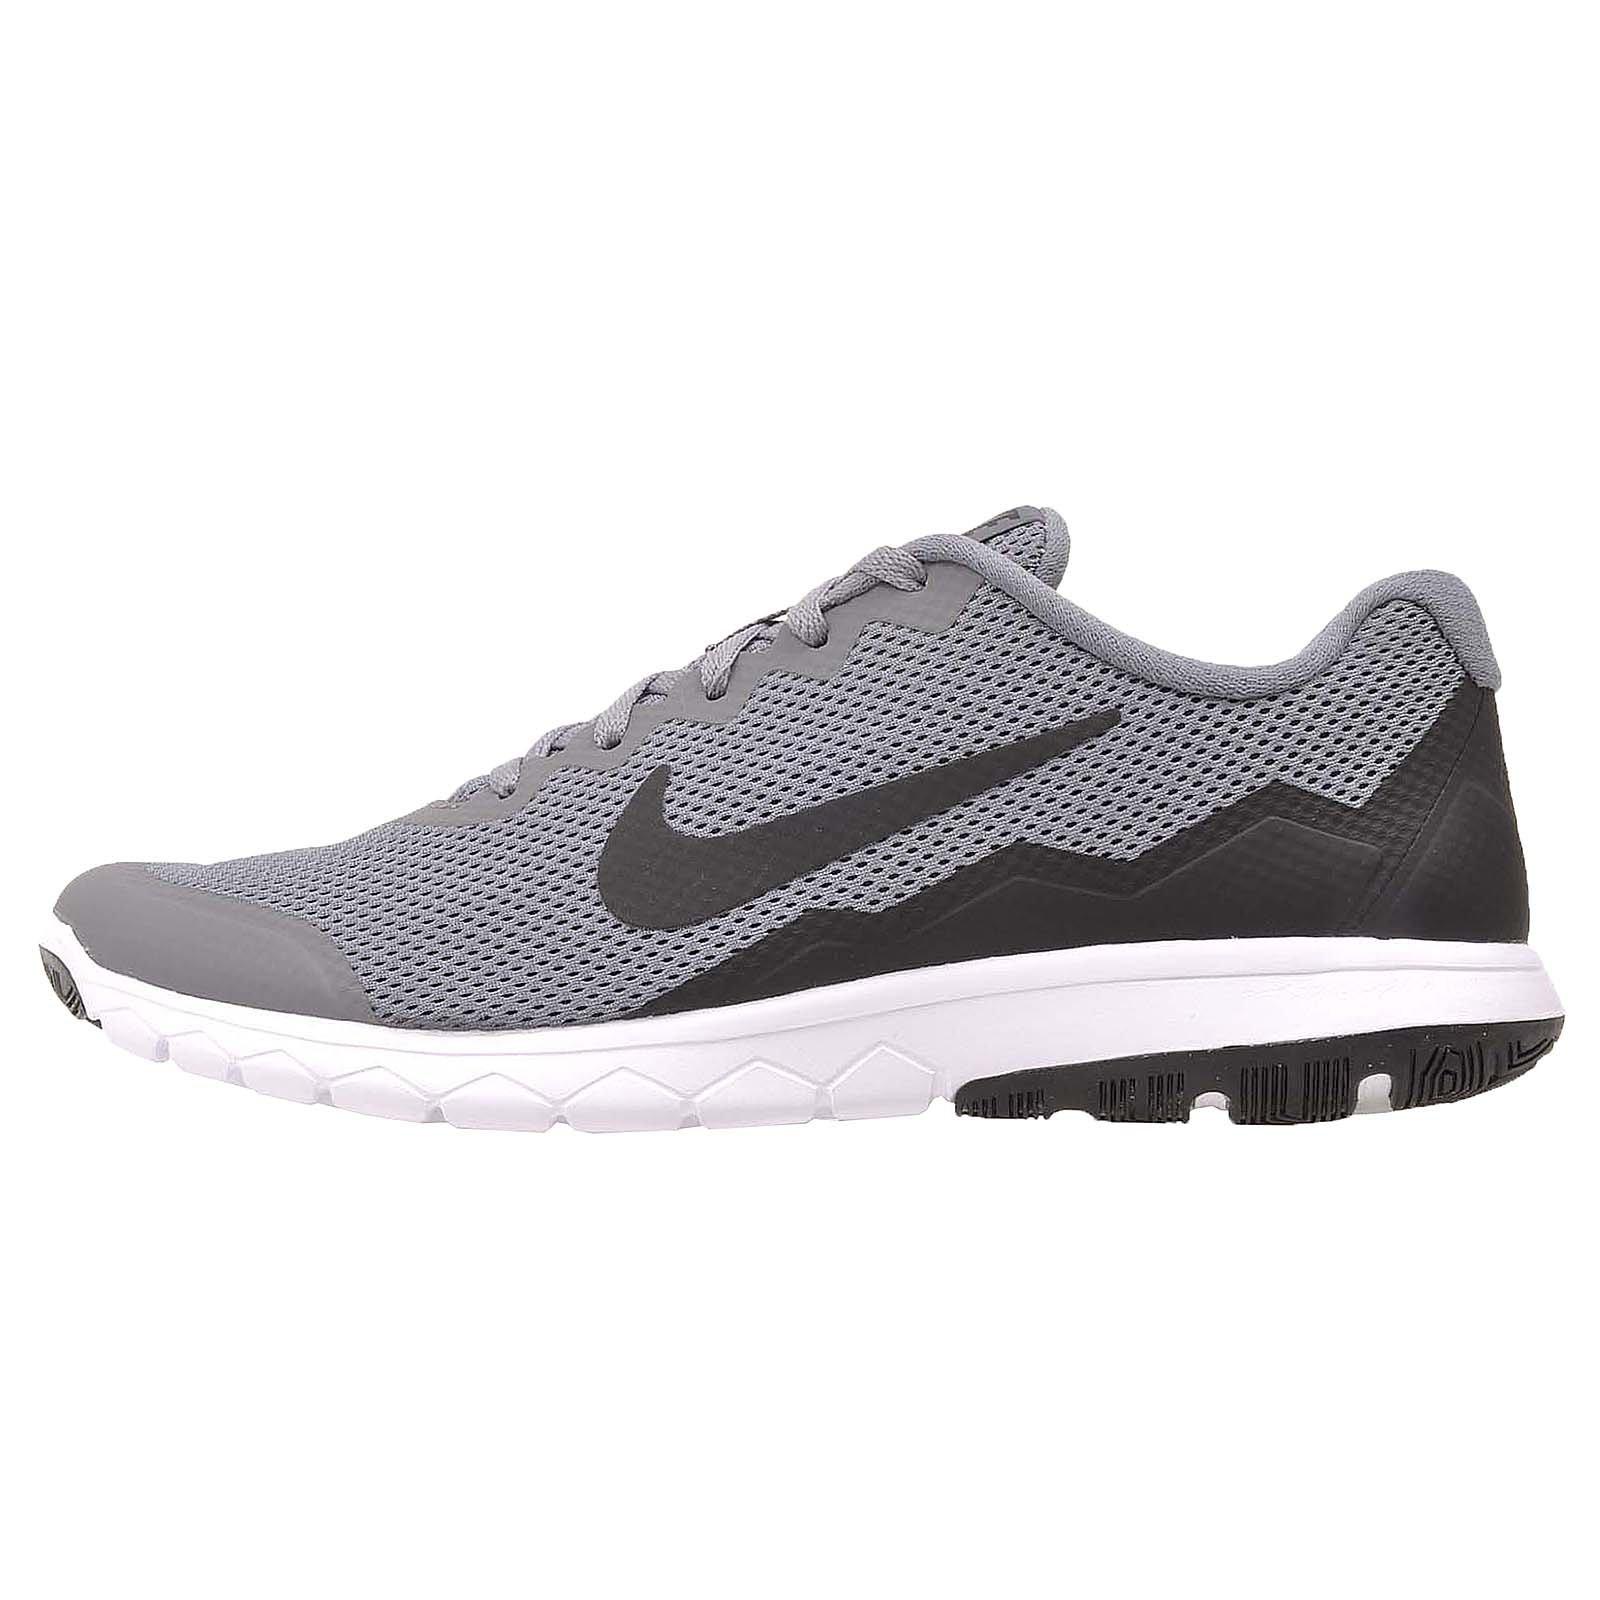 a27c87ec87e07 Nike Men's Flex Experience RN (Cool Grey/Black/Black) Running Shoe, 7.5  D(M) US